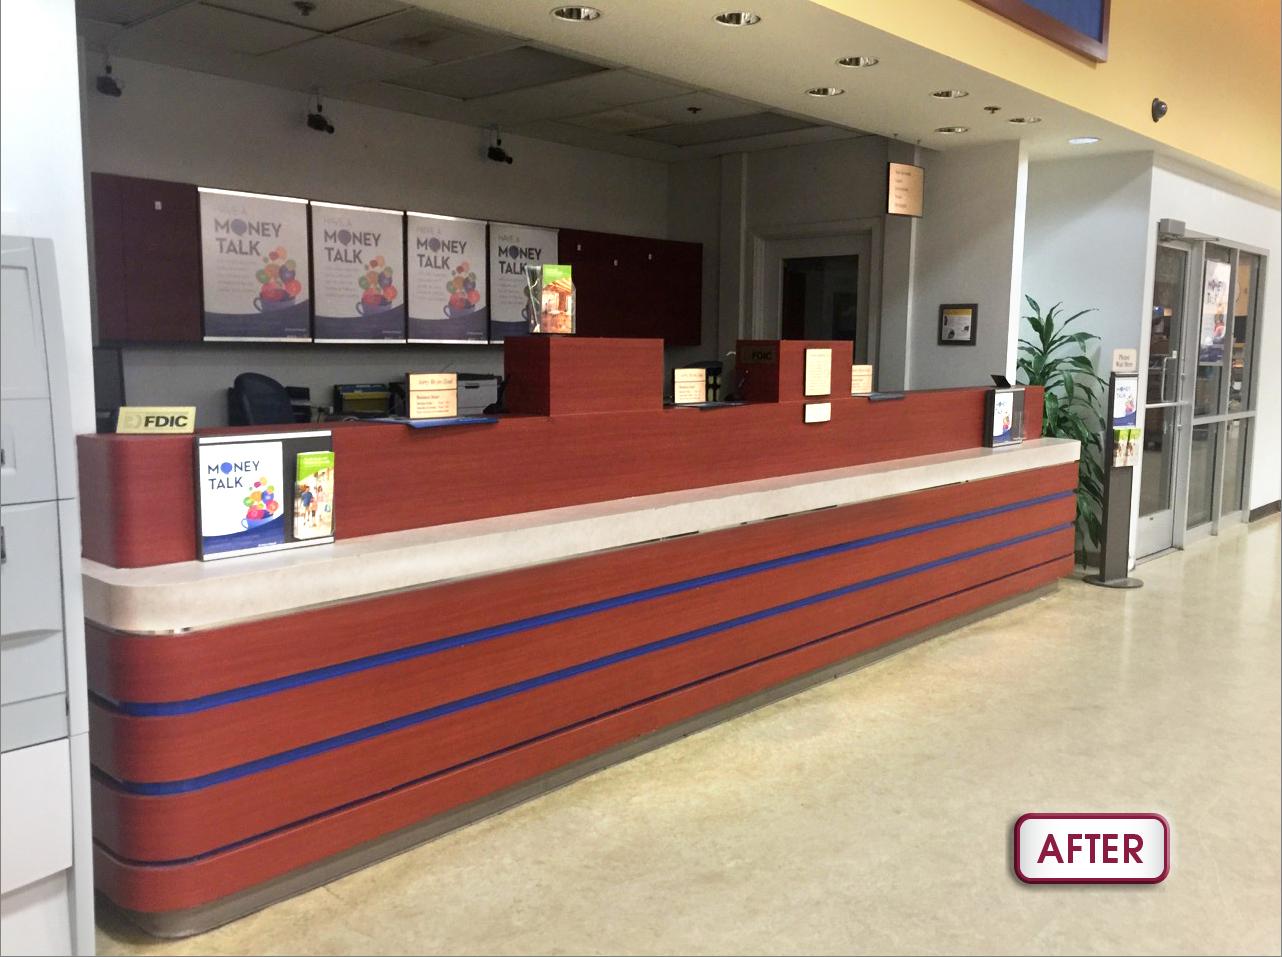 Bank Of Hawaii Hawaii Kai Safeway Branch Counter Refurbished Counter After